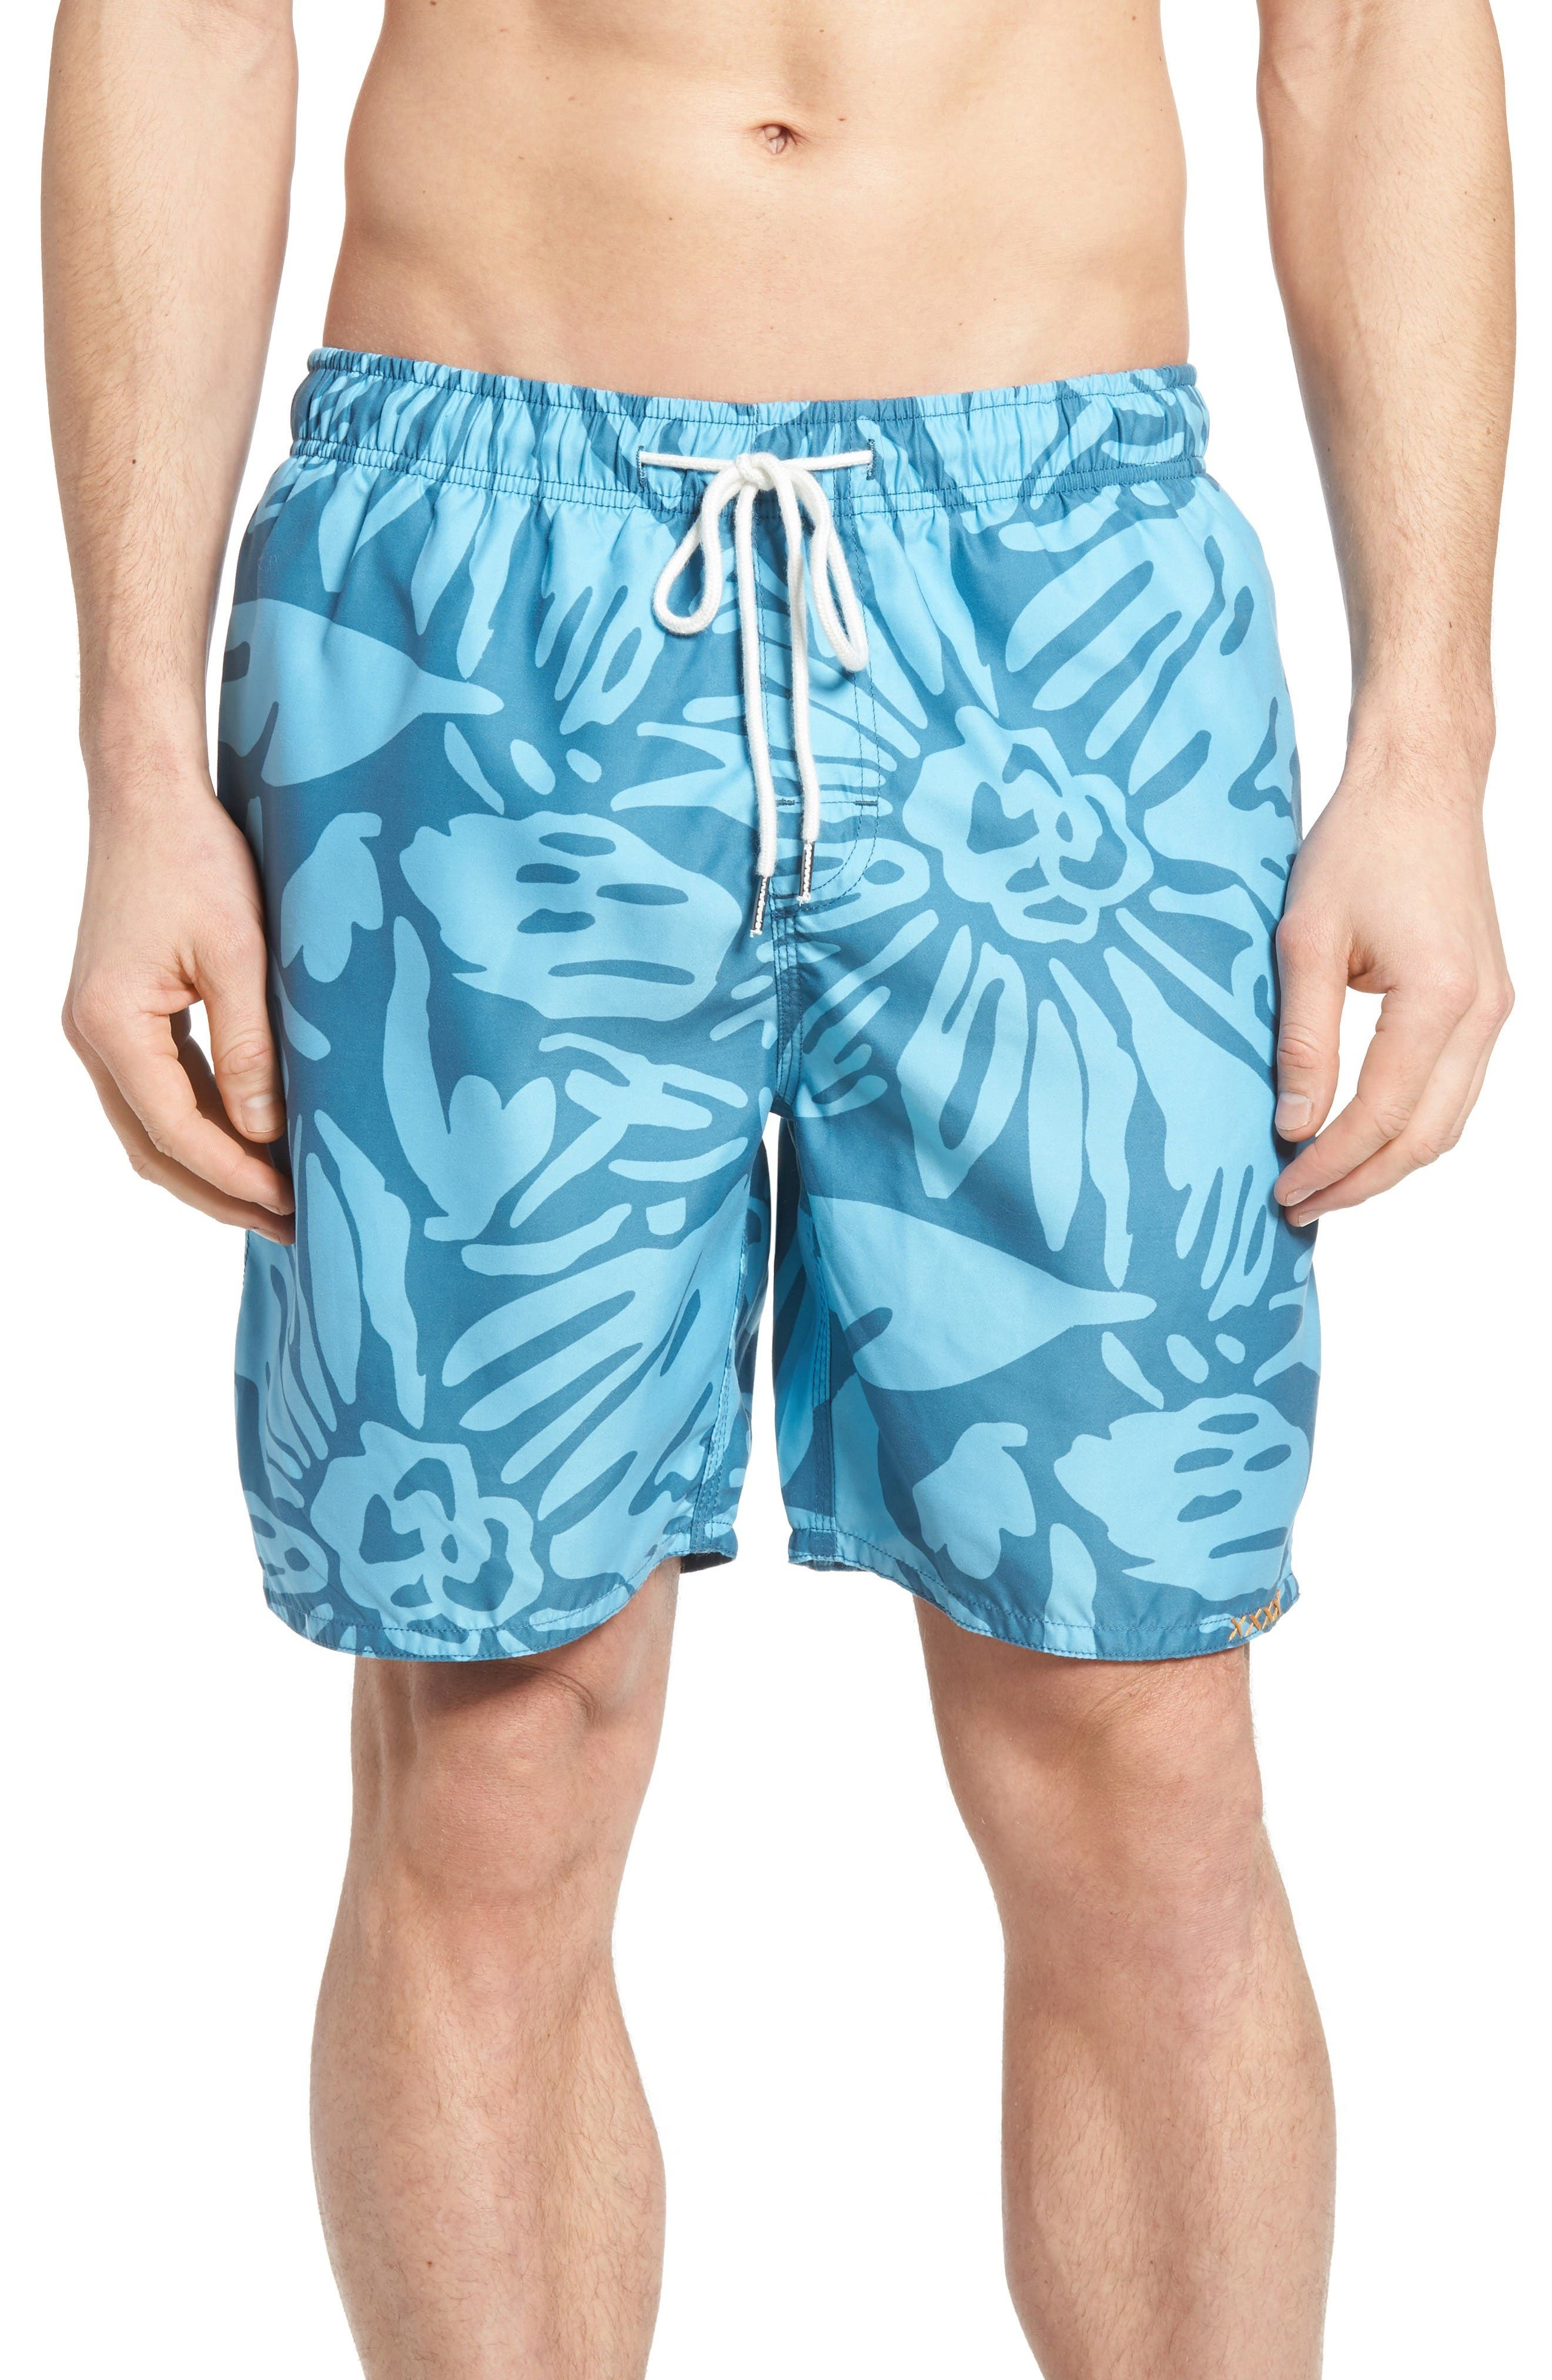 Viceroy Print Swim Trunks,                         Main,                         color, Blue